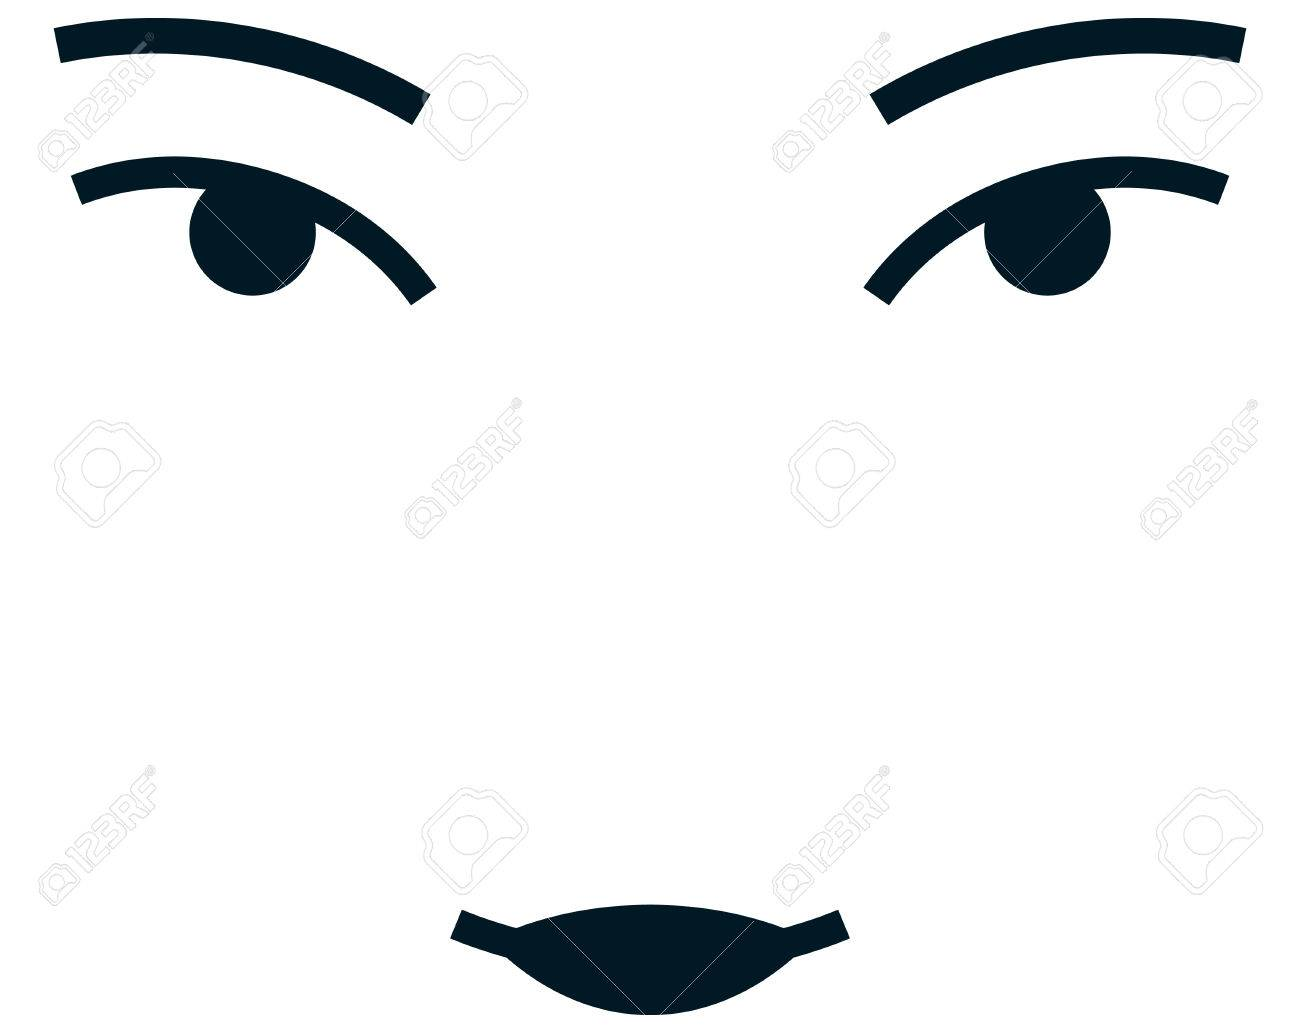 Asian girl woman female face vector illustration isolated.